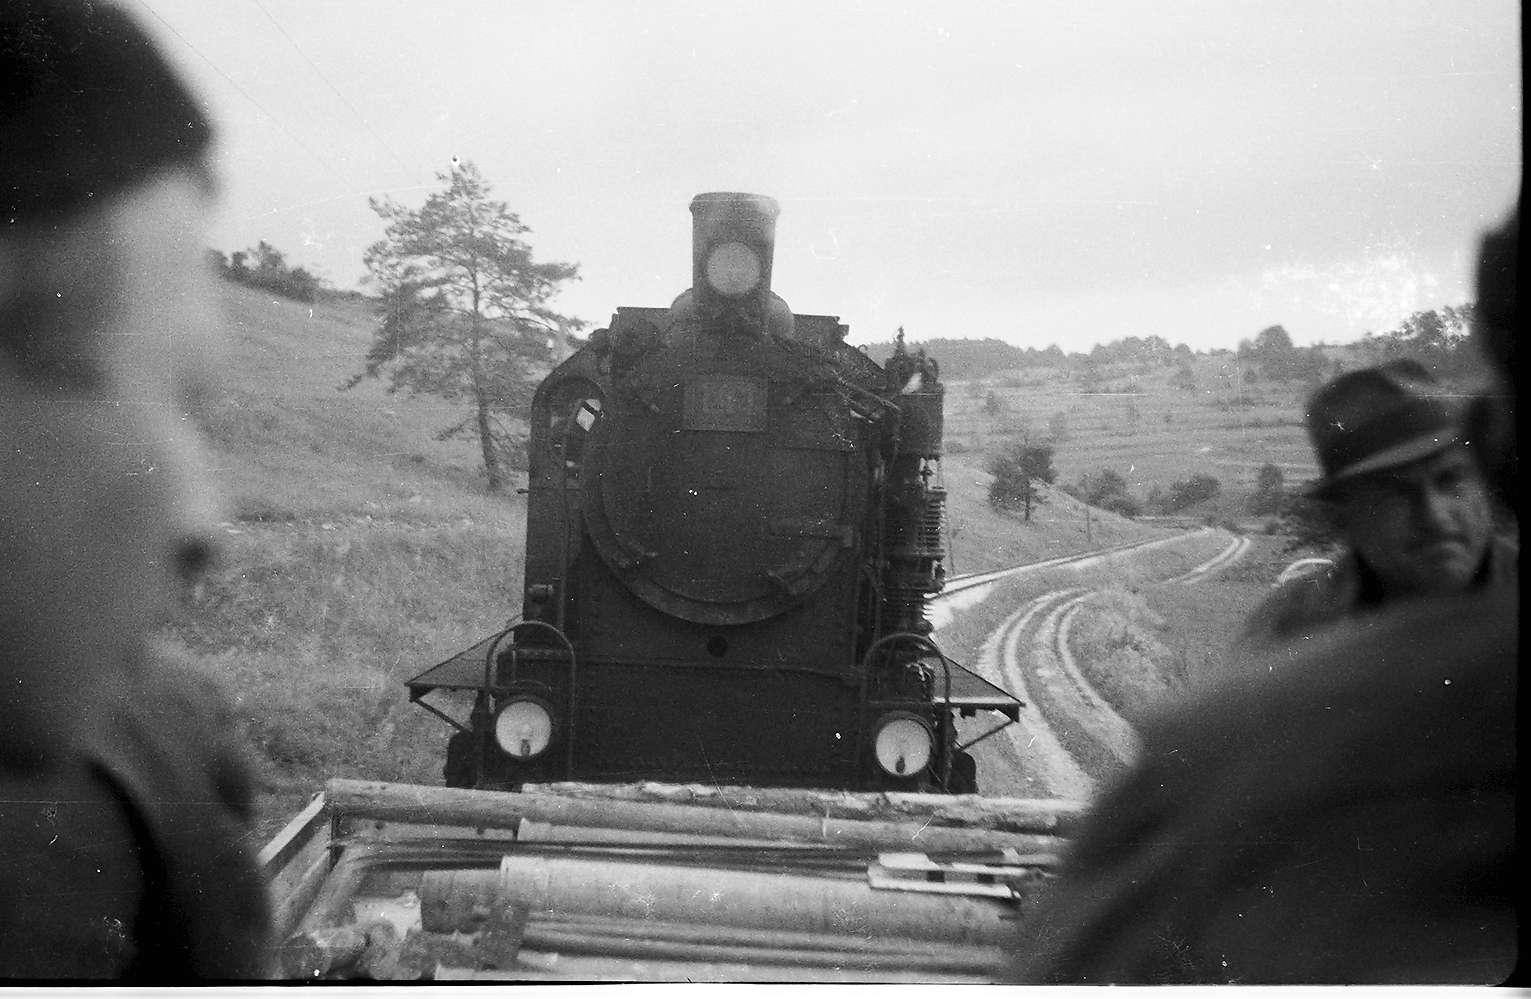 Lok 141, Az 419/20, Veringendorf - Veringenstadt, Arbeitszug, Blick vom offenen X-Wagen, Rotte Gammertingen, zuständig für die Strecke Burladingen bis Veringenstadt, Bild 1